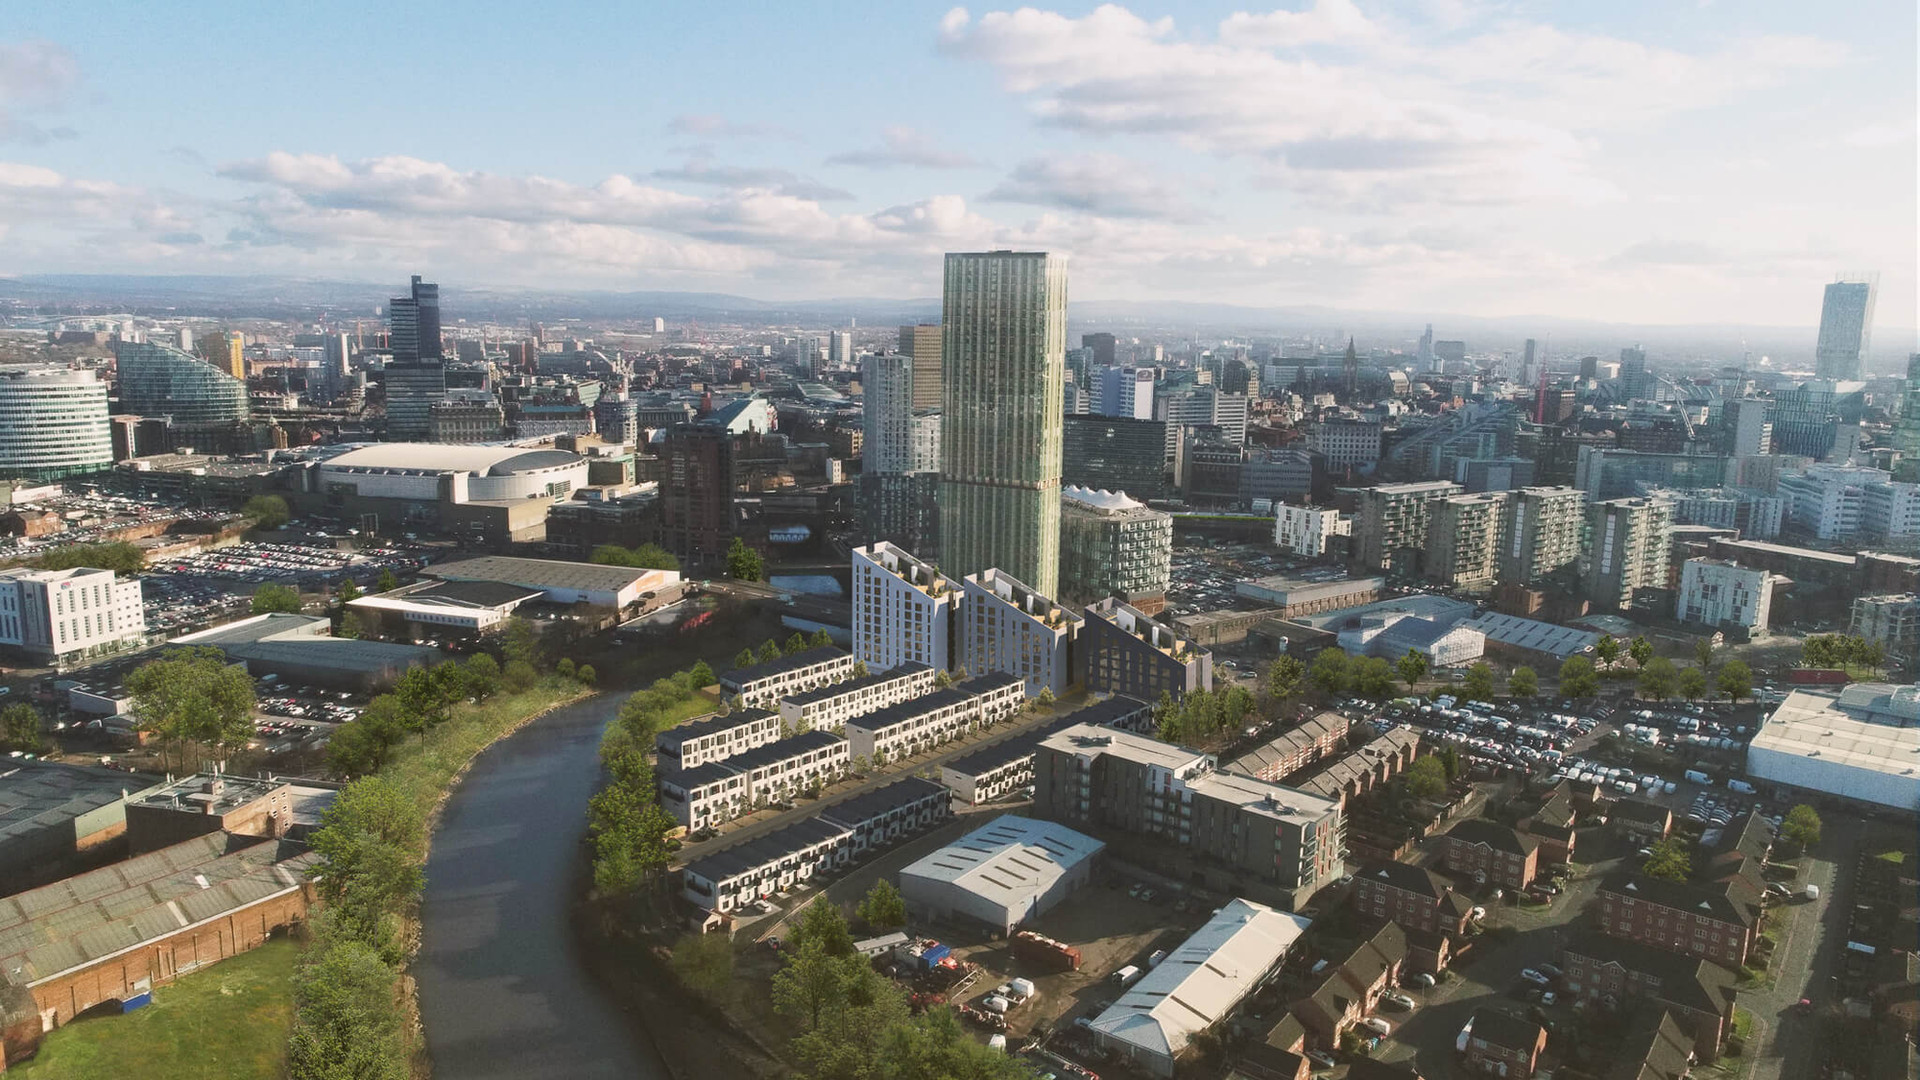 photomontage-cgi-irwell-riverside-aerial